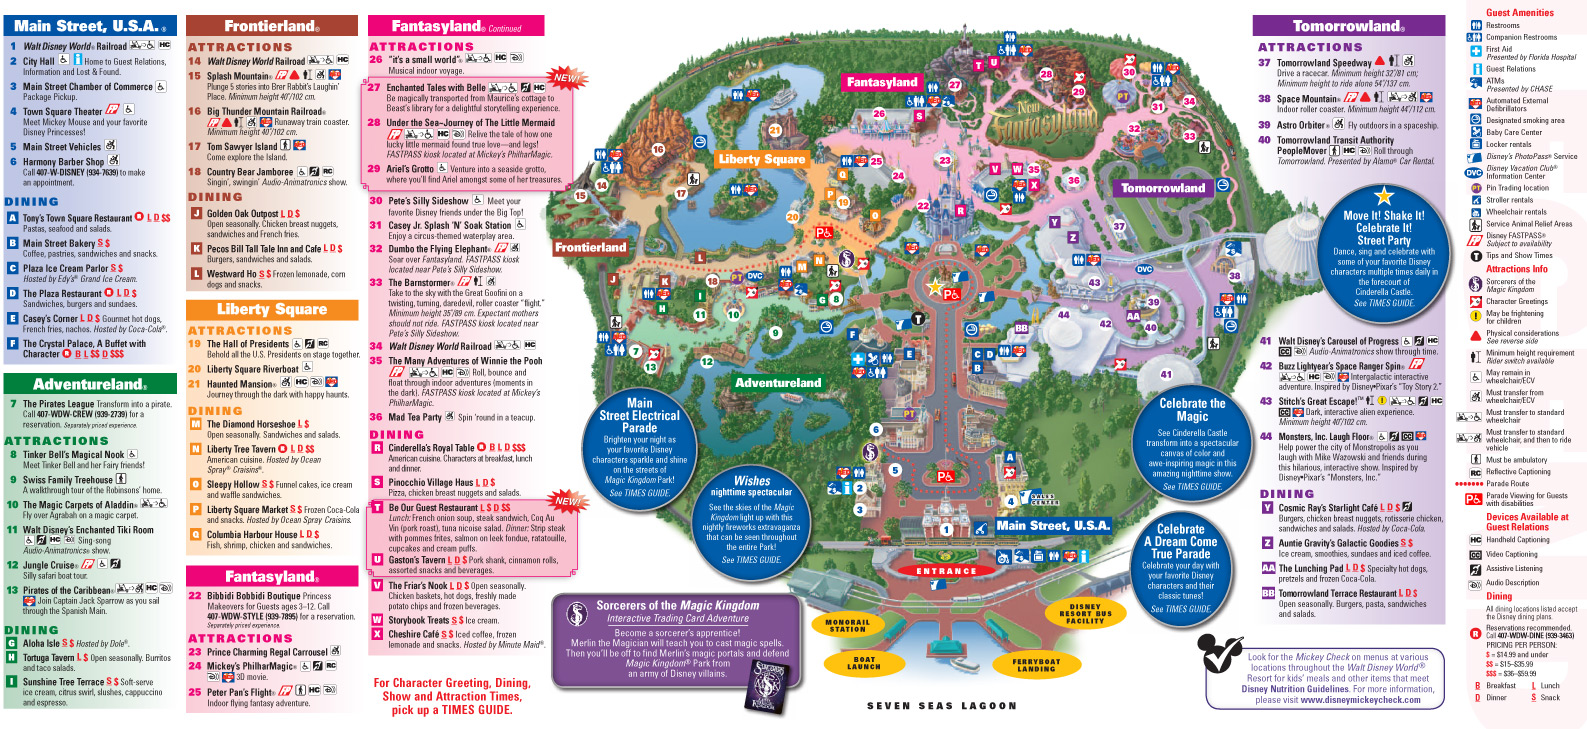 Park Maps 2013 - Photo 6 of 8